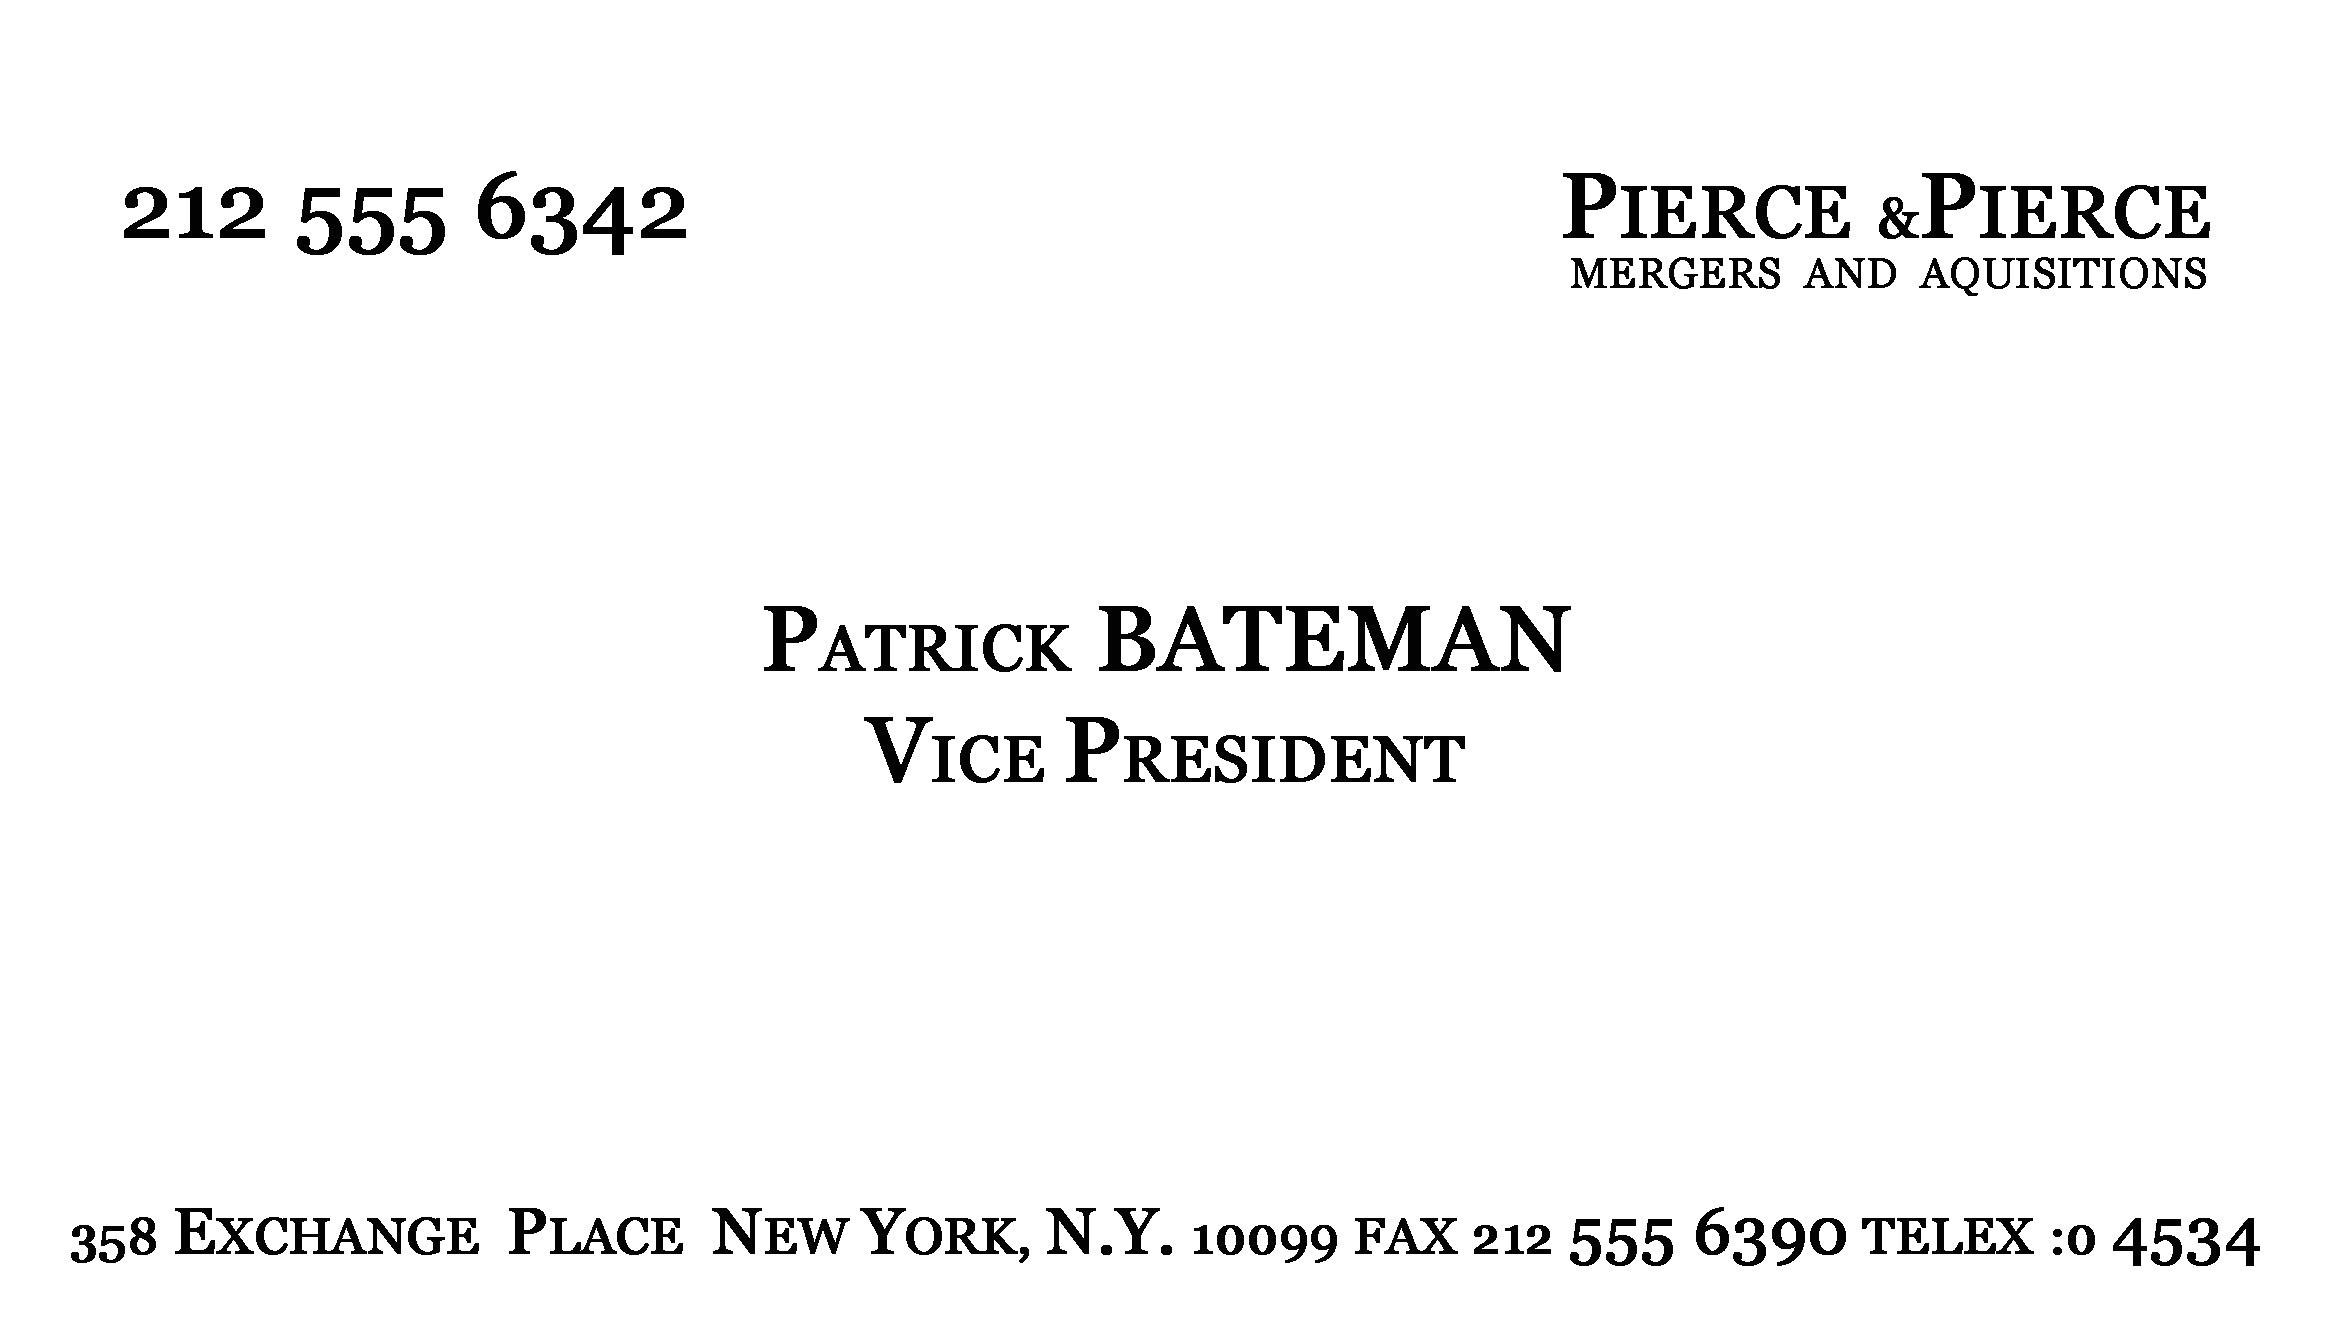 Patrick Bateman Business Card Template Make Patrick Bateman 39 S Business Card Youtube